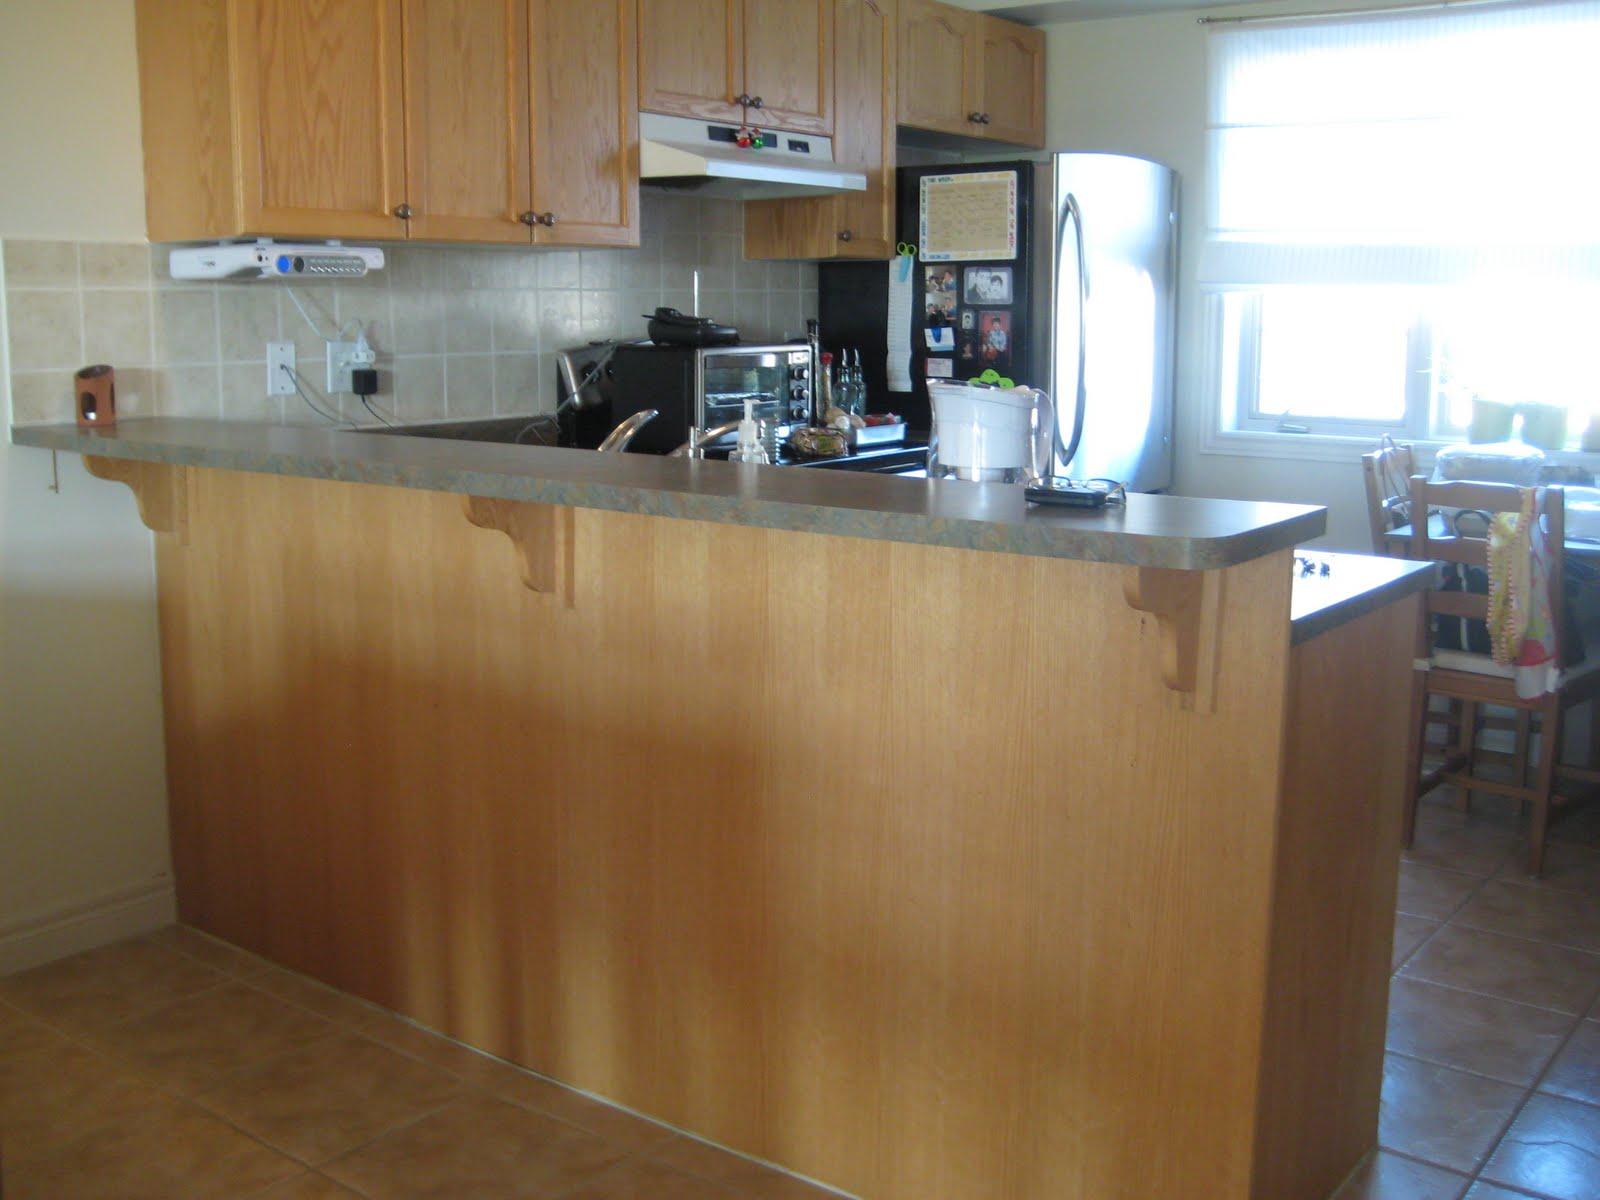 Countertop Dishwasher Rona : Life is a Hotpot: June 2010